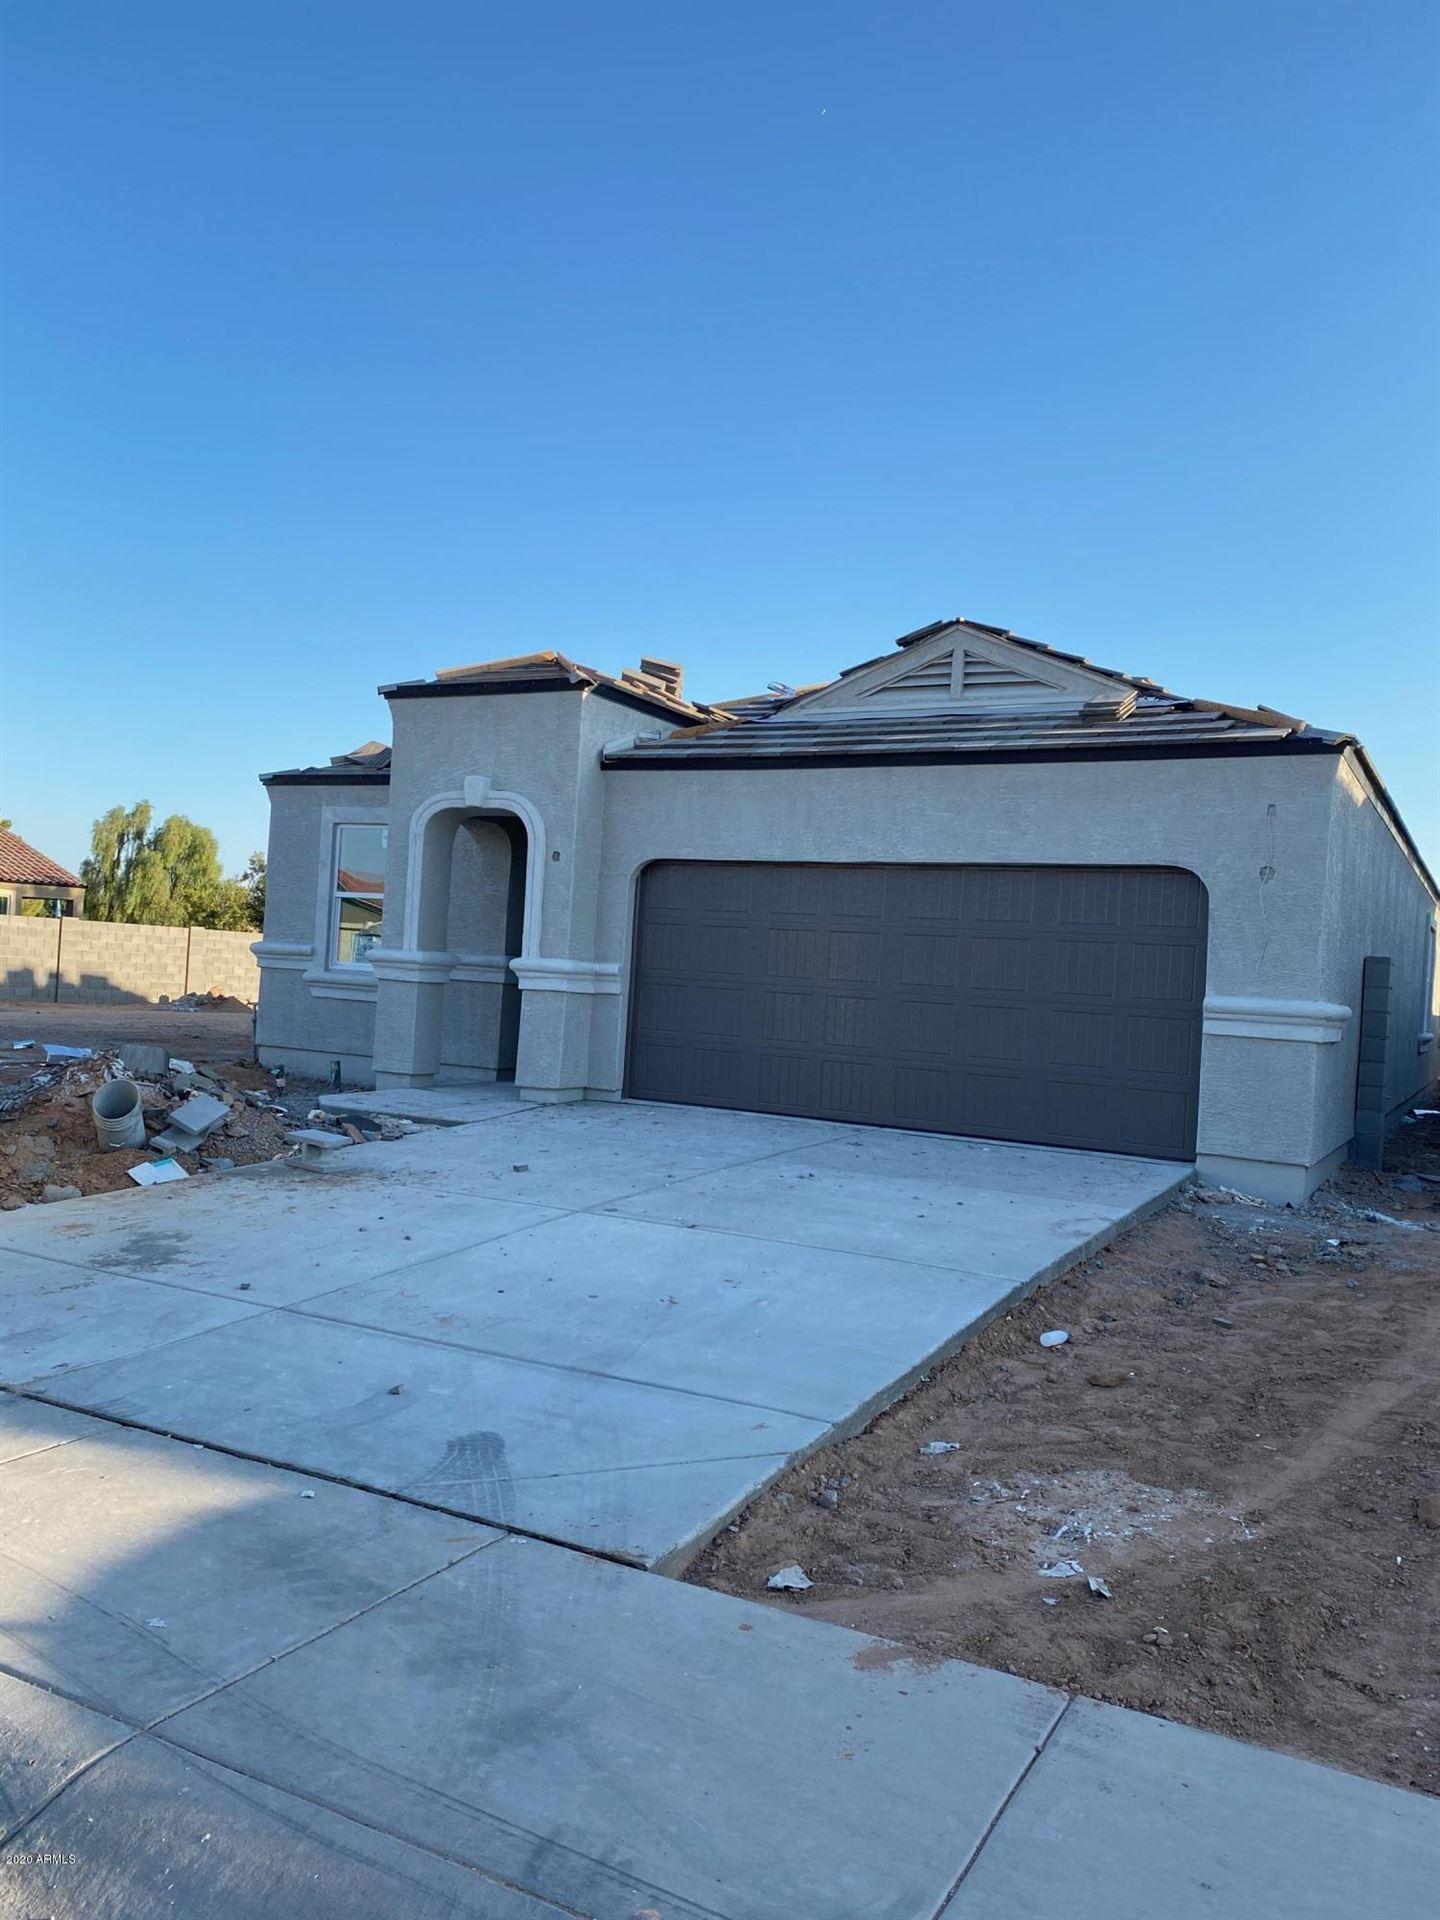 20195 N VALENCIA Drive, Maricopa, AZ 85138 - MLS#: 6132038